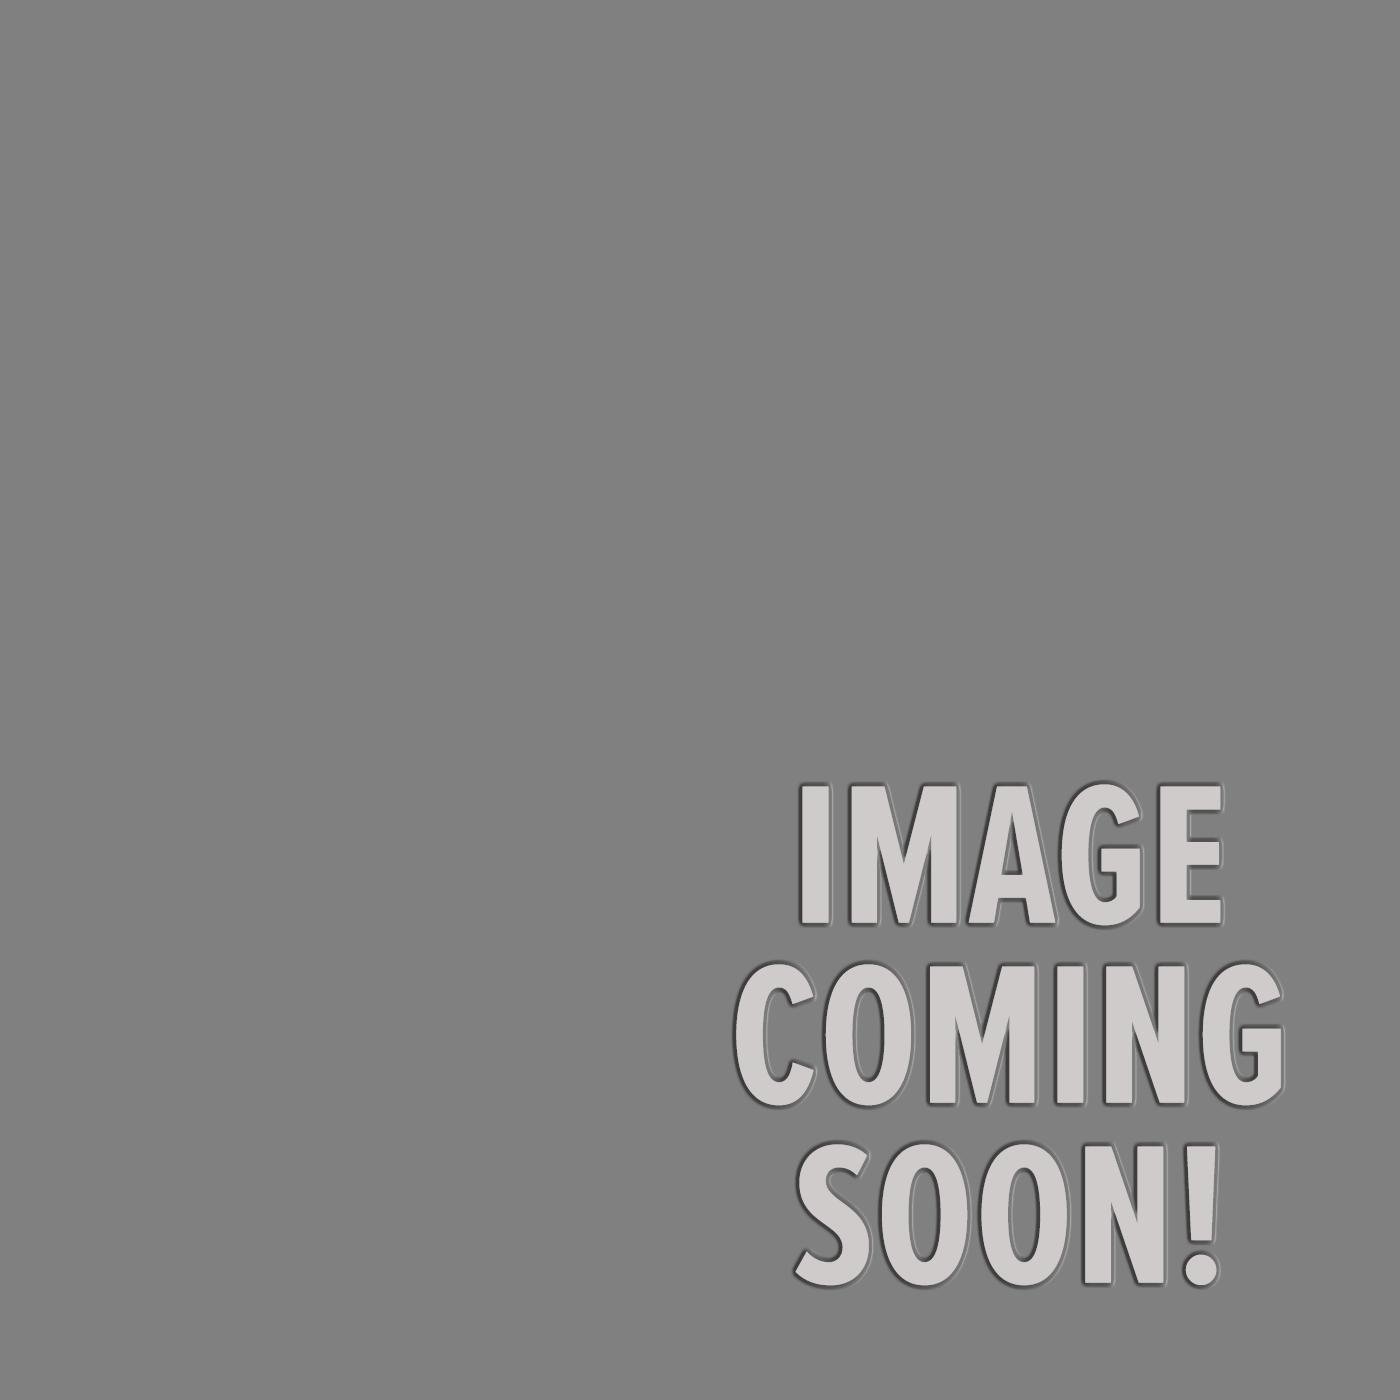 Image for Signature JR-208 Javier Reyes 8-String Baritone Electric Guitar (Pelham) from SamAsh